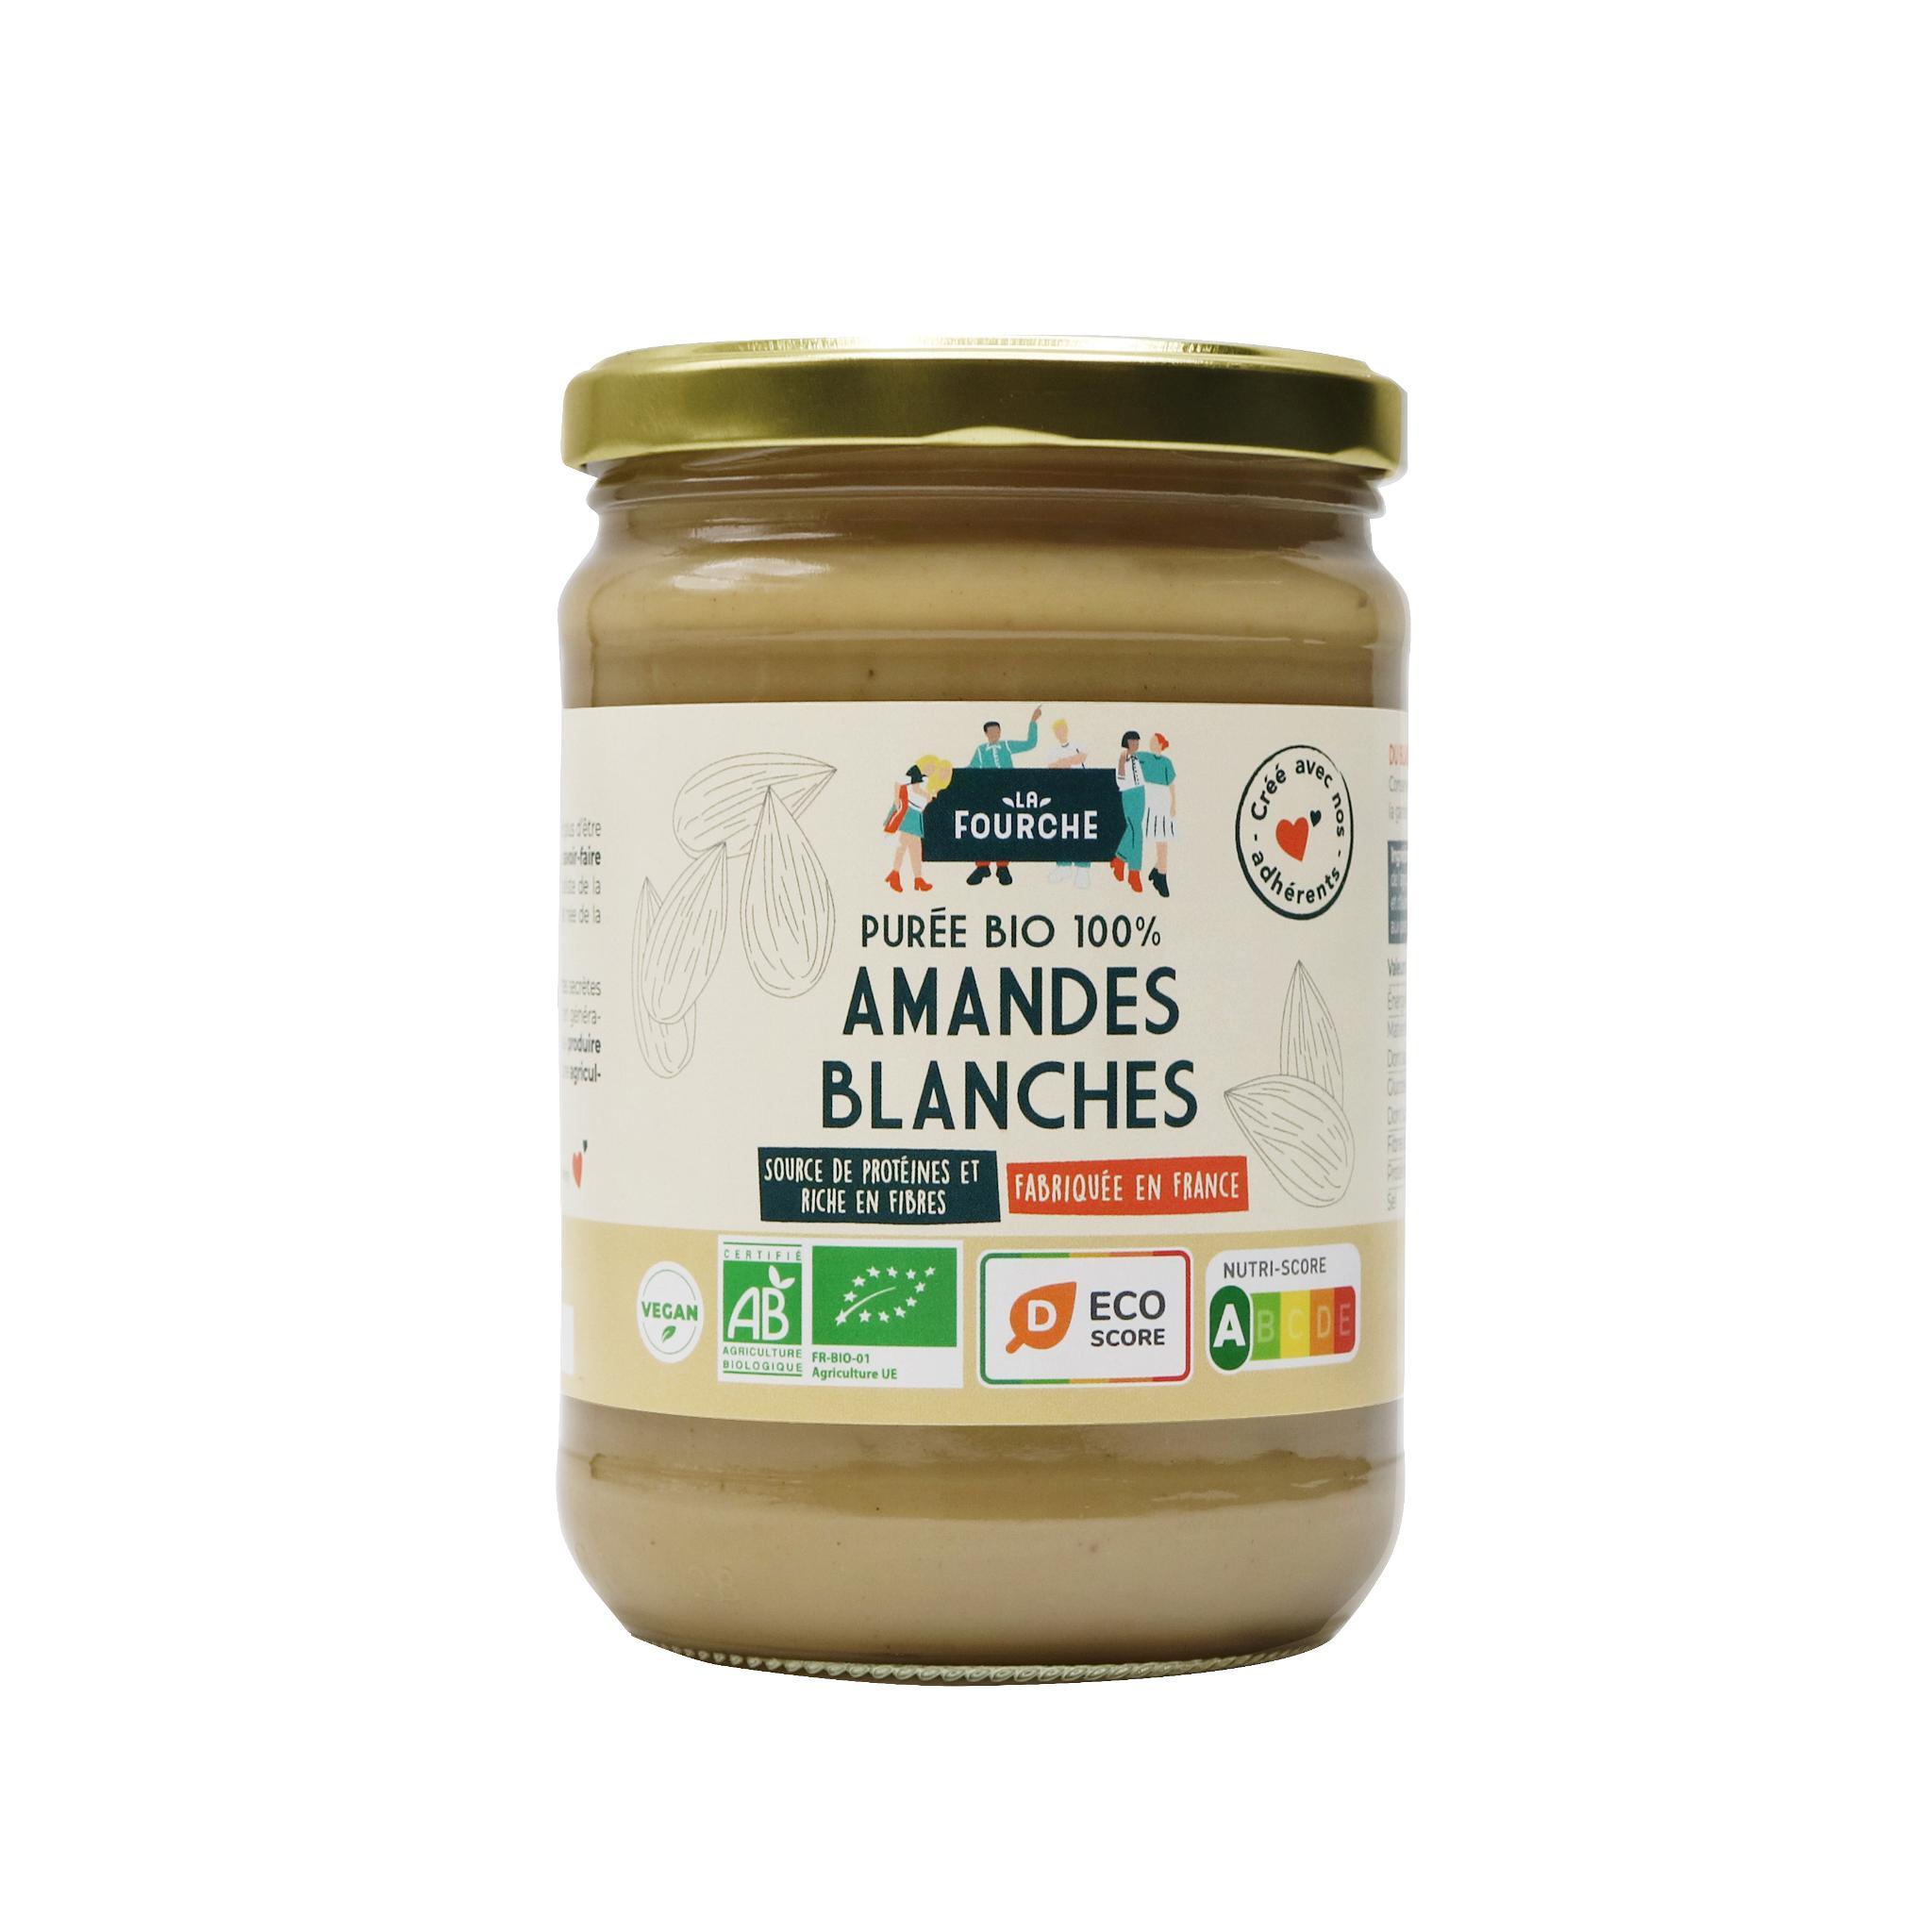 img-la-fourche-puree-100-amandes-blanches-grillees-bio-0-5kg